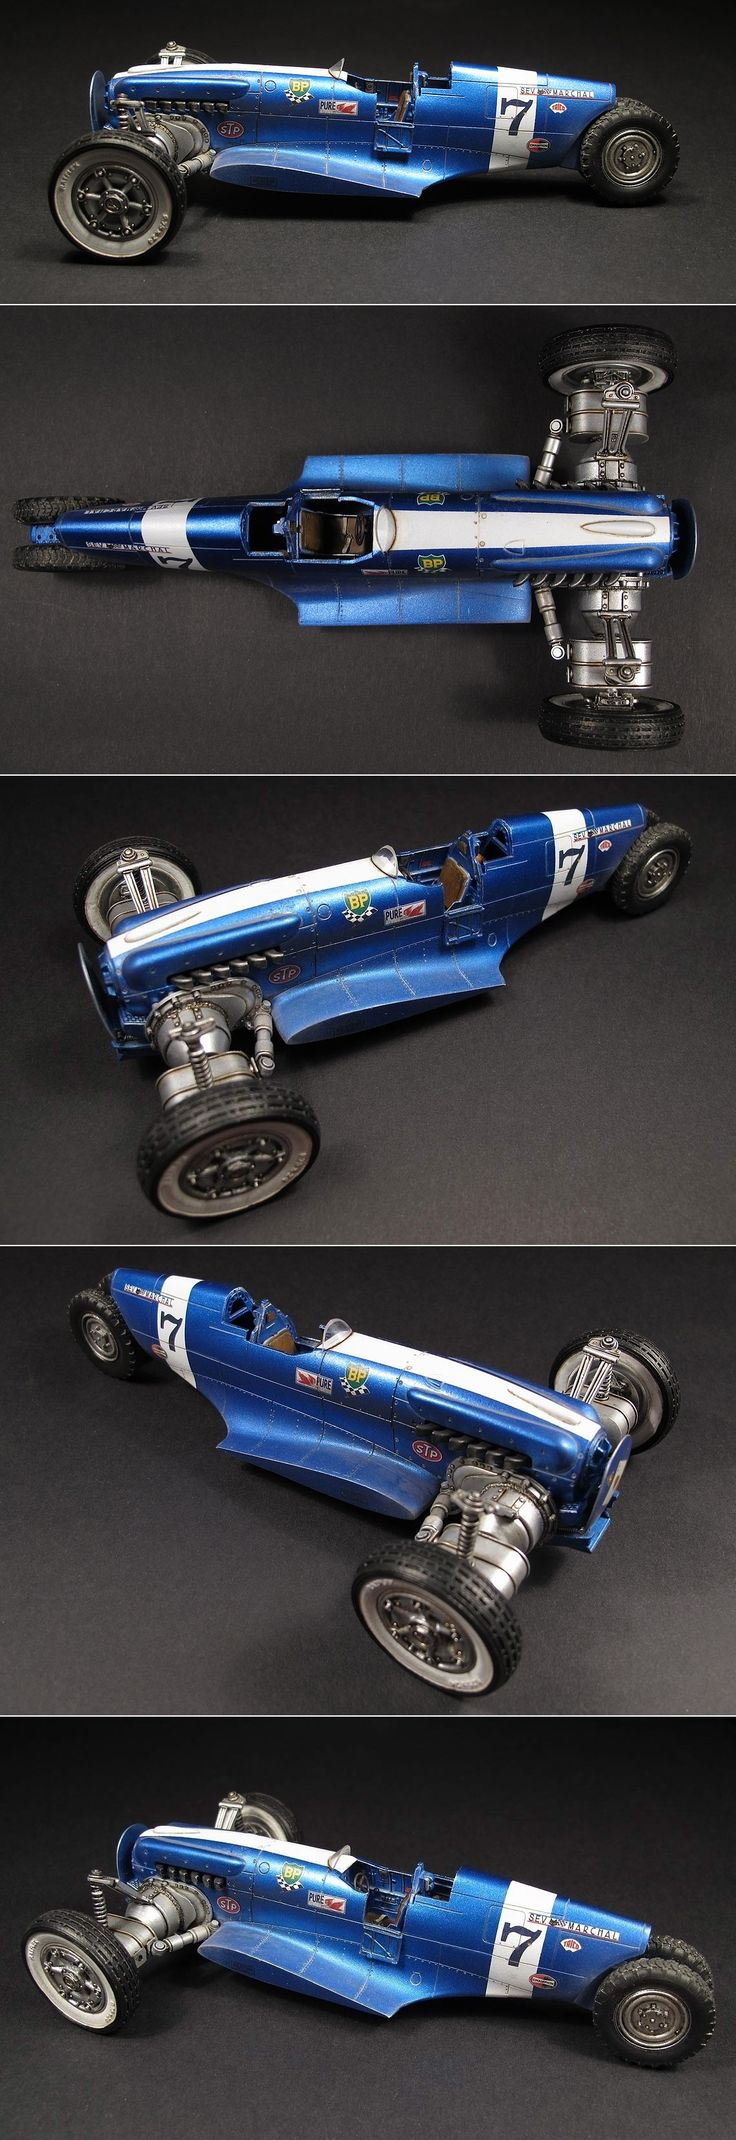 Junk Tank Rock Racer - Viper racing car - Kitbashing a Viper…